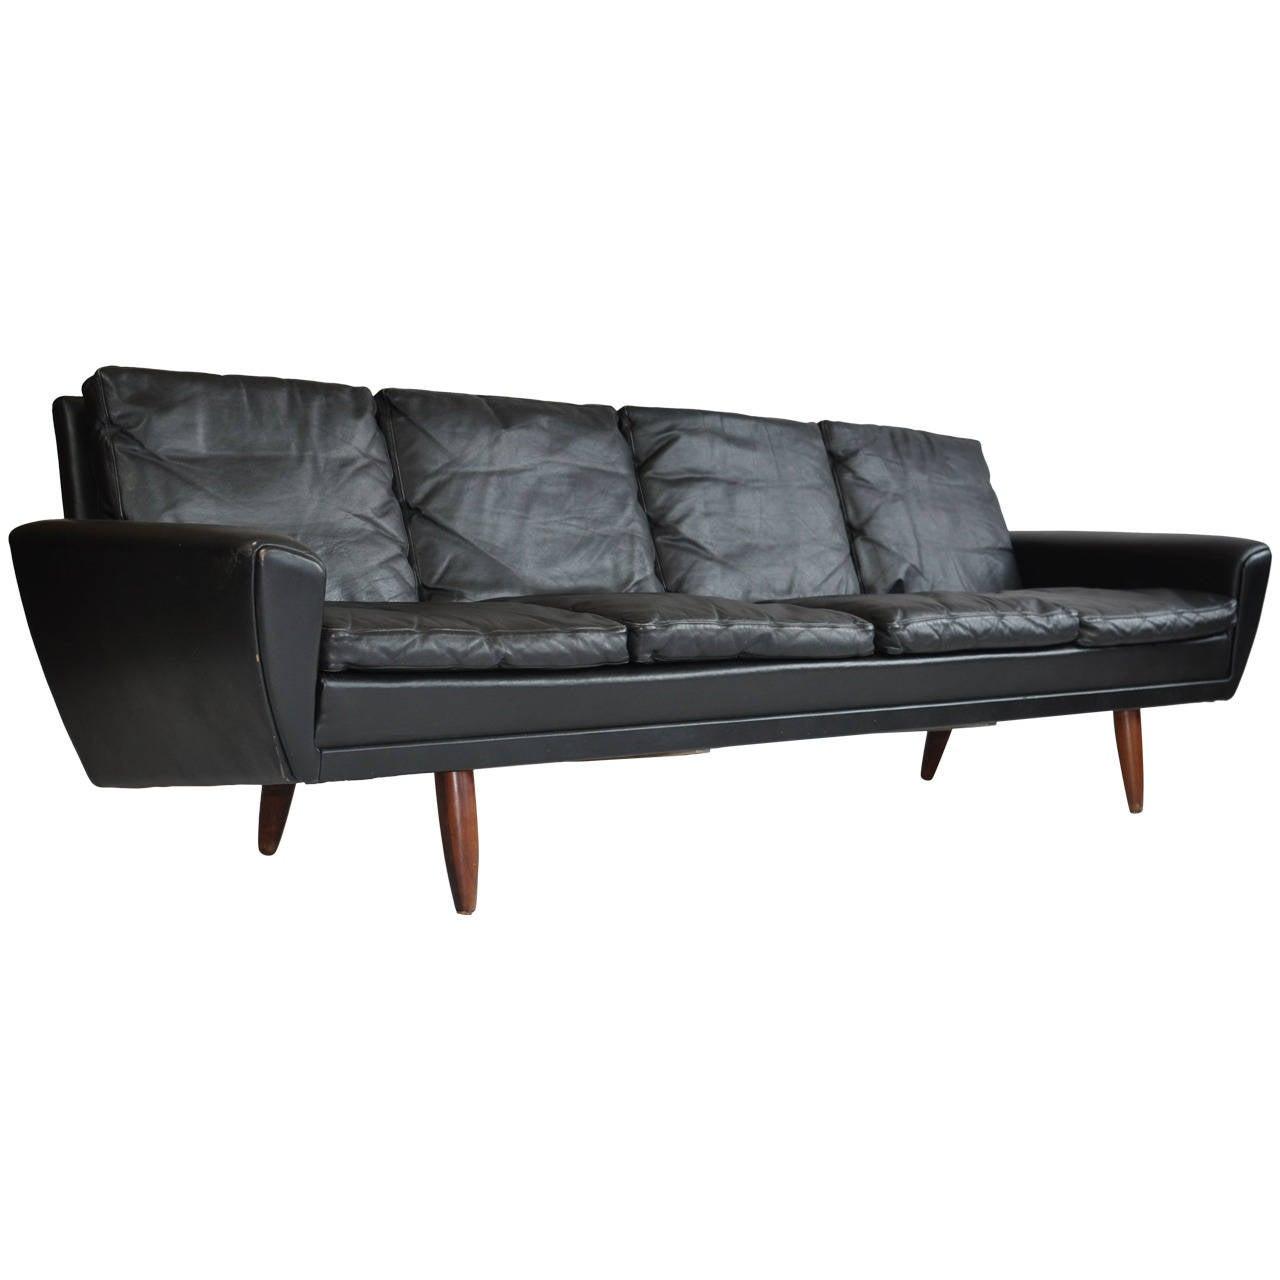 XL 1970's Danish Rosewood And Leather Modular Sofa